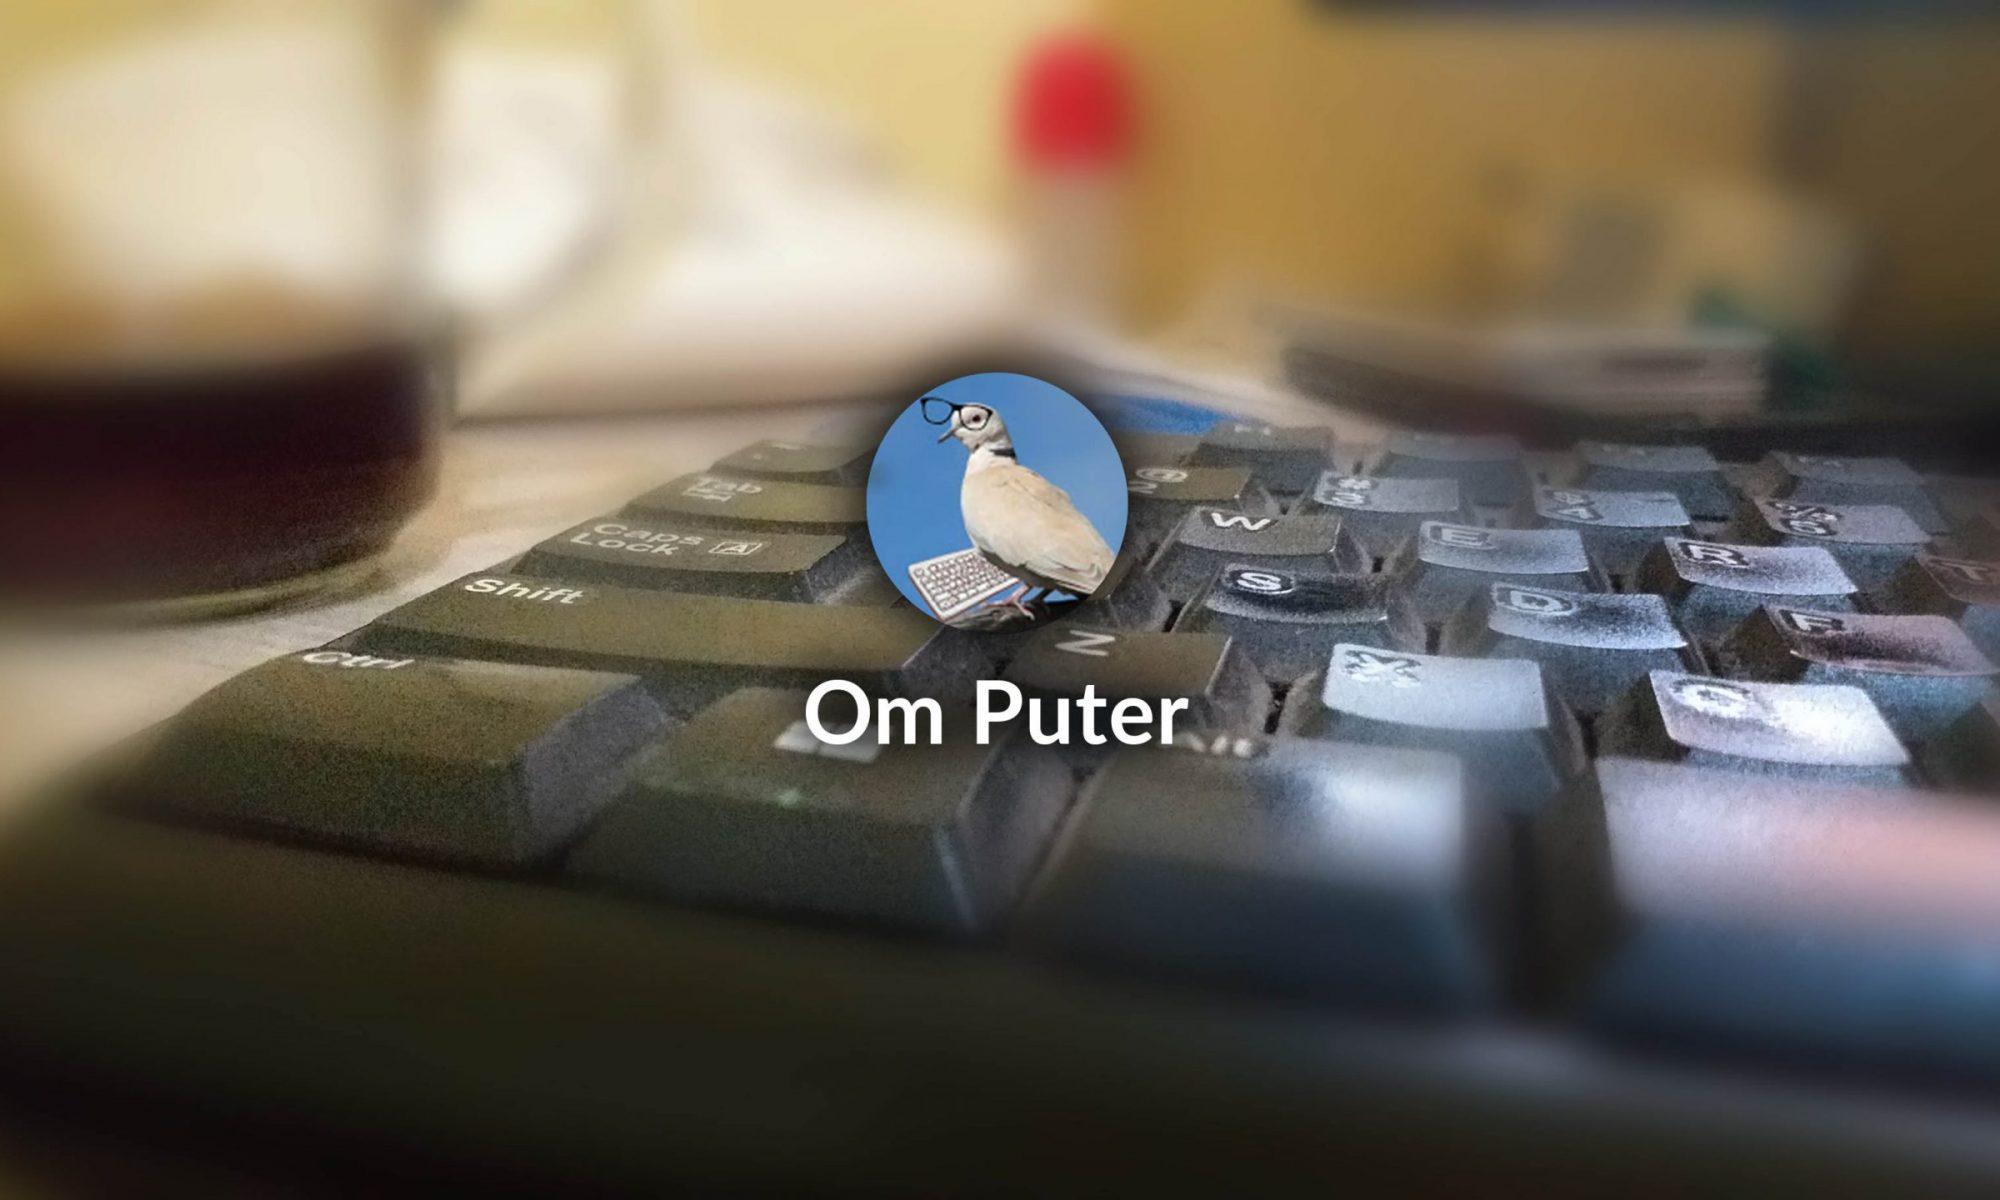 Om Puter